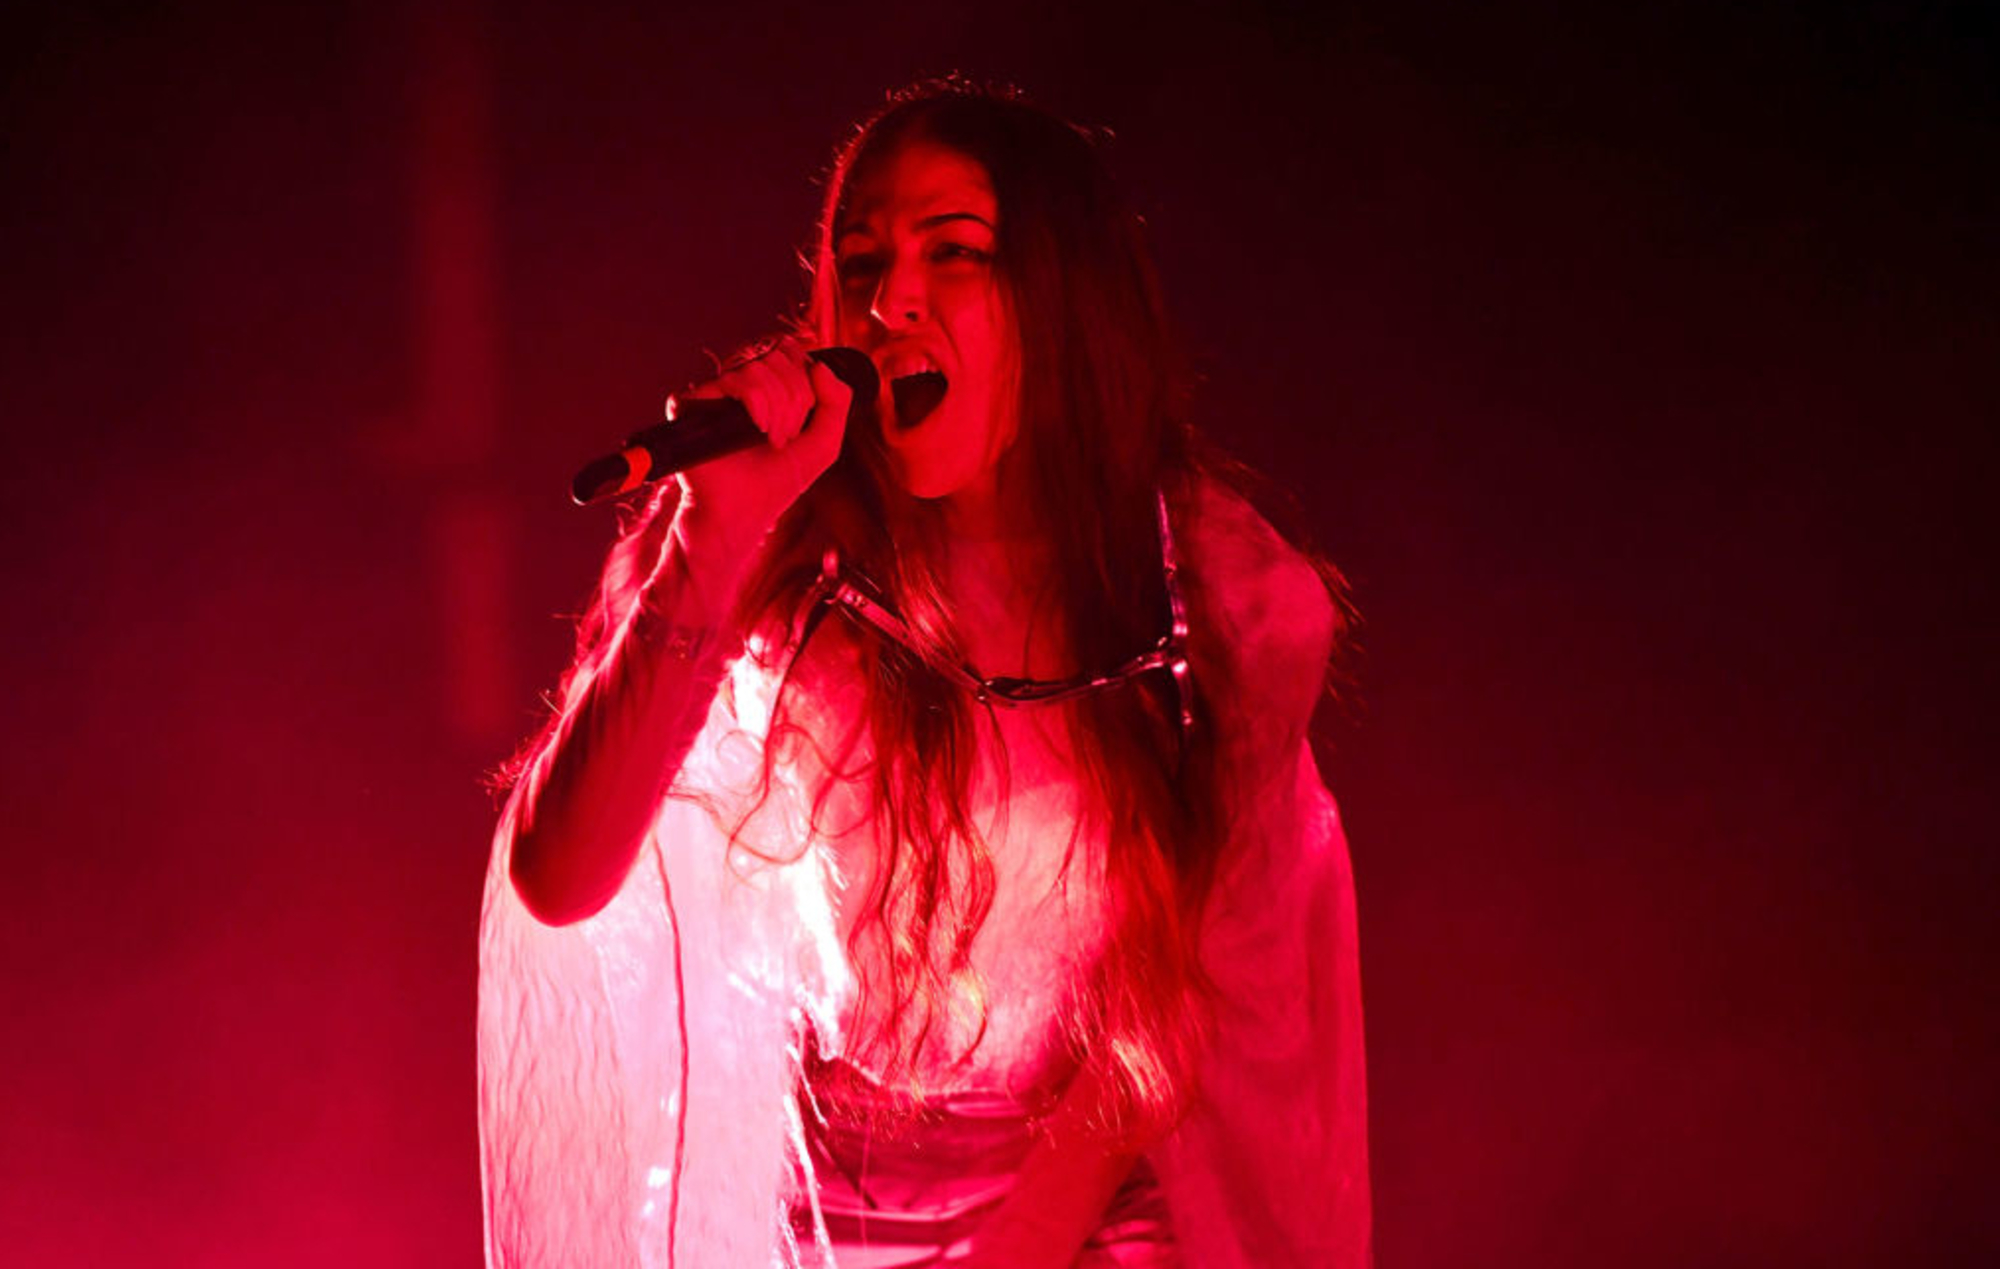 Caroline Polachek teases new music set to arrive this week